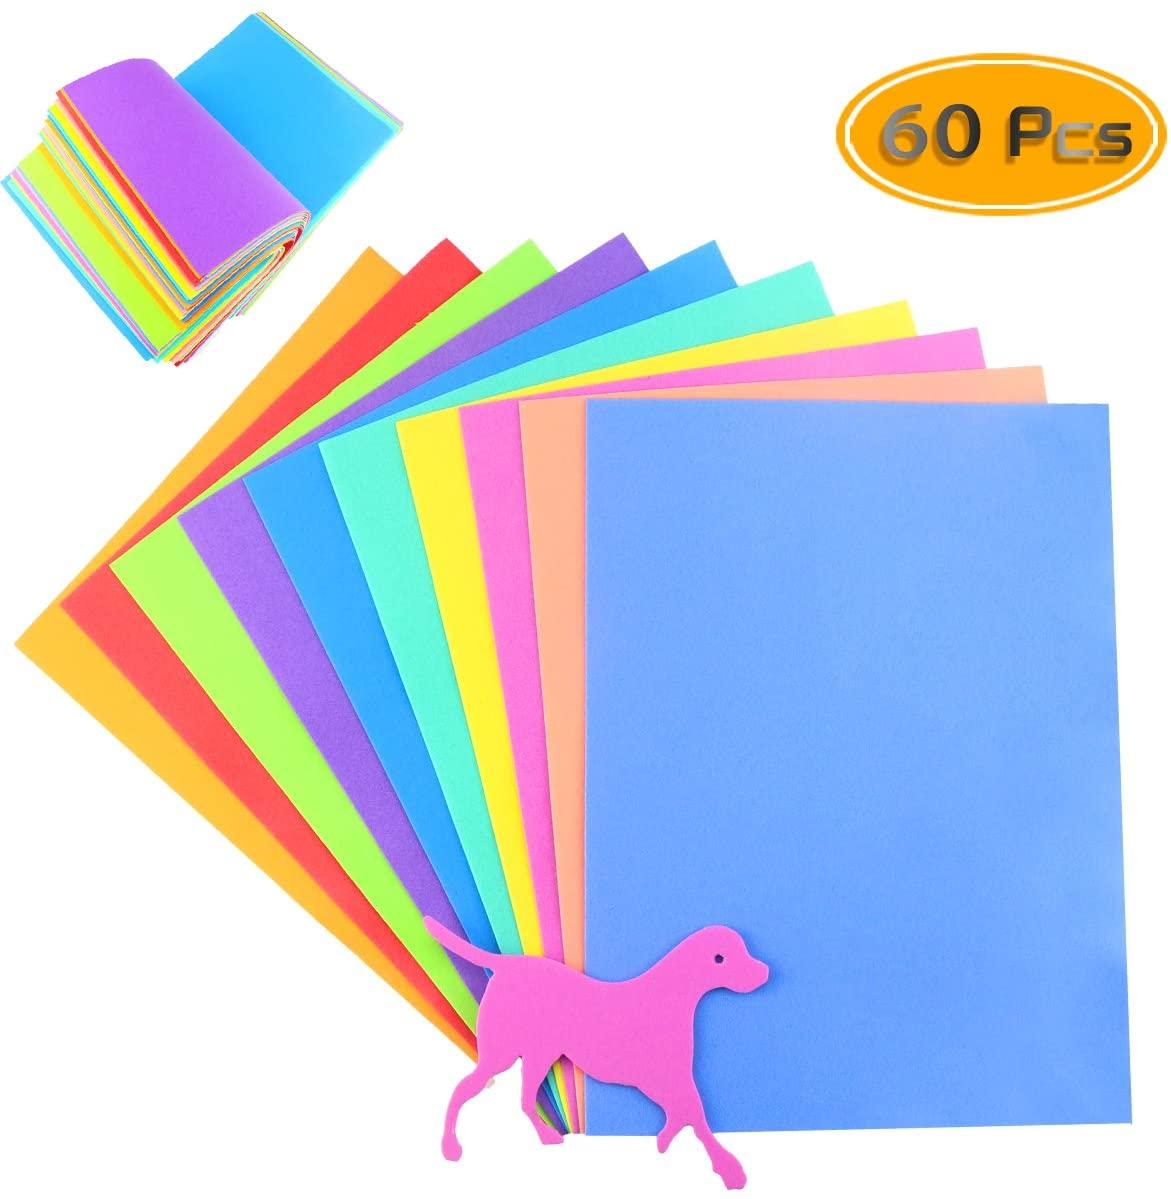 BcPowr 60PCS EVA Craft Foam Sheets, Foamie Sheets Rainbow Foam Handicraft Sheets Colorful Crafting Sponge For Arts DIY Projects, Classroom, Scrapbooking, Parties(10Color, 11